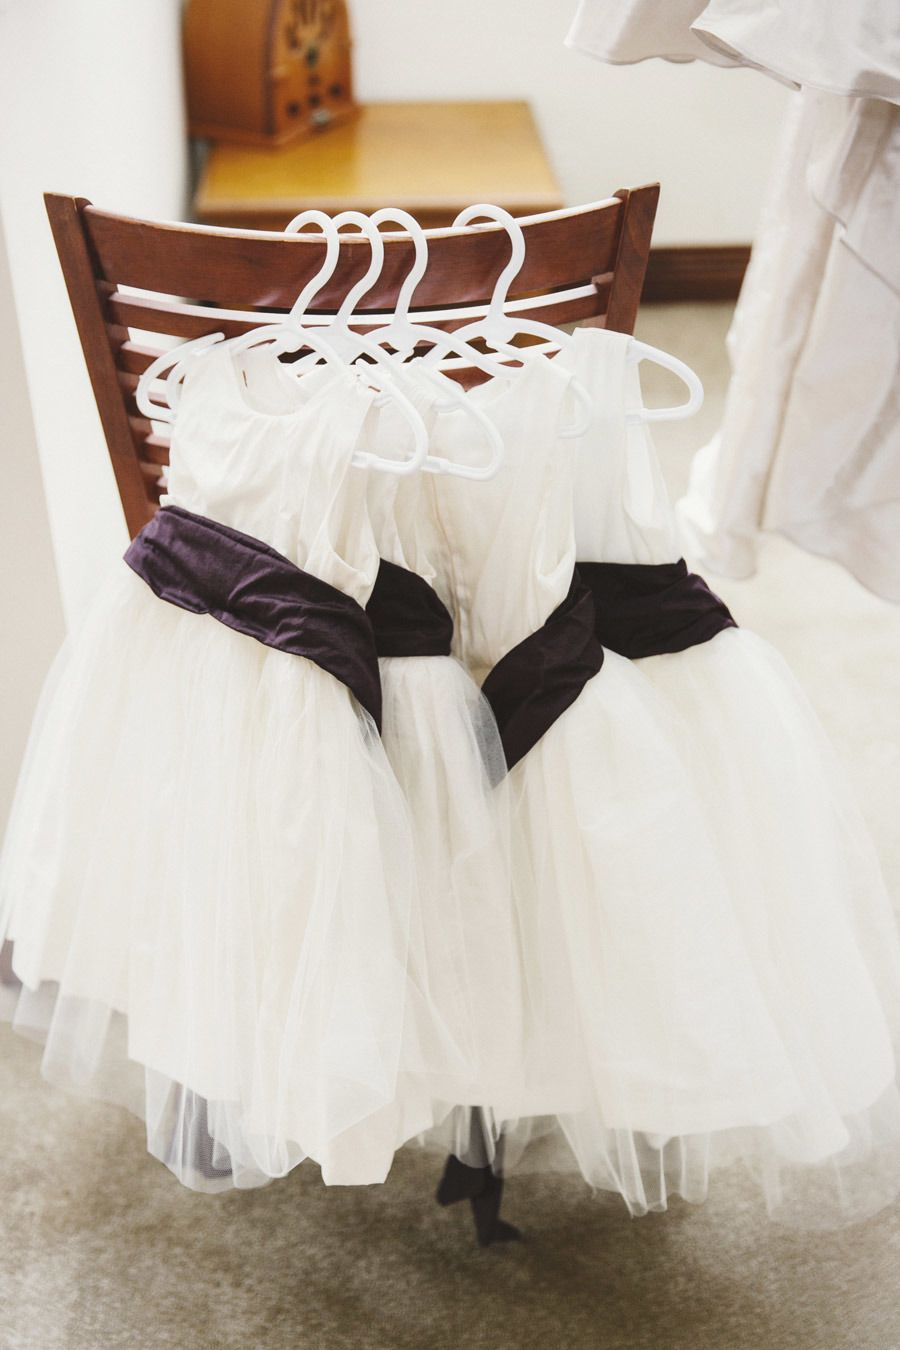 #FlowerGirls on #SMP Weddings:  http://www.stylemepretty.com/australia-weddings/queensland-au/2013/12/09/queensland-wedding-at-maleny-manor/  Calli B Photography